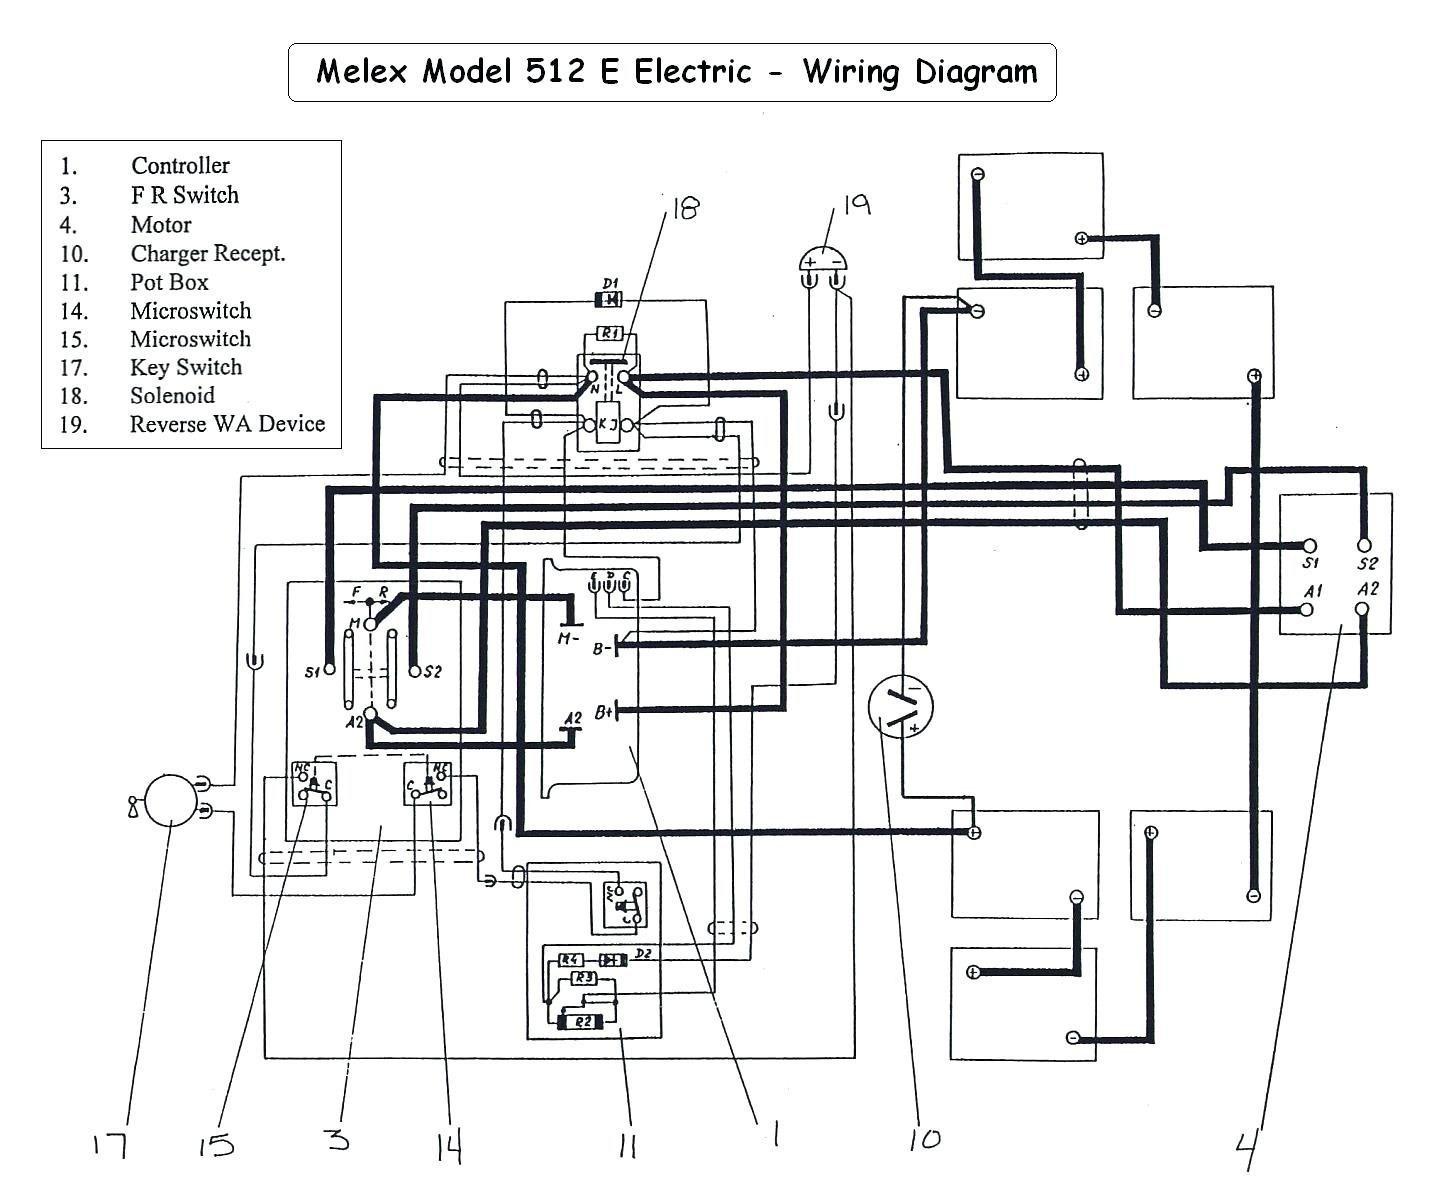 ez go golf cart wiring diagram gas engine 1992 ezgo wiring diagram golfcartpartsdirect e wire ez go gas golf cart wiring diagram pdf vintage 17a